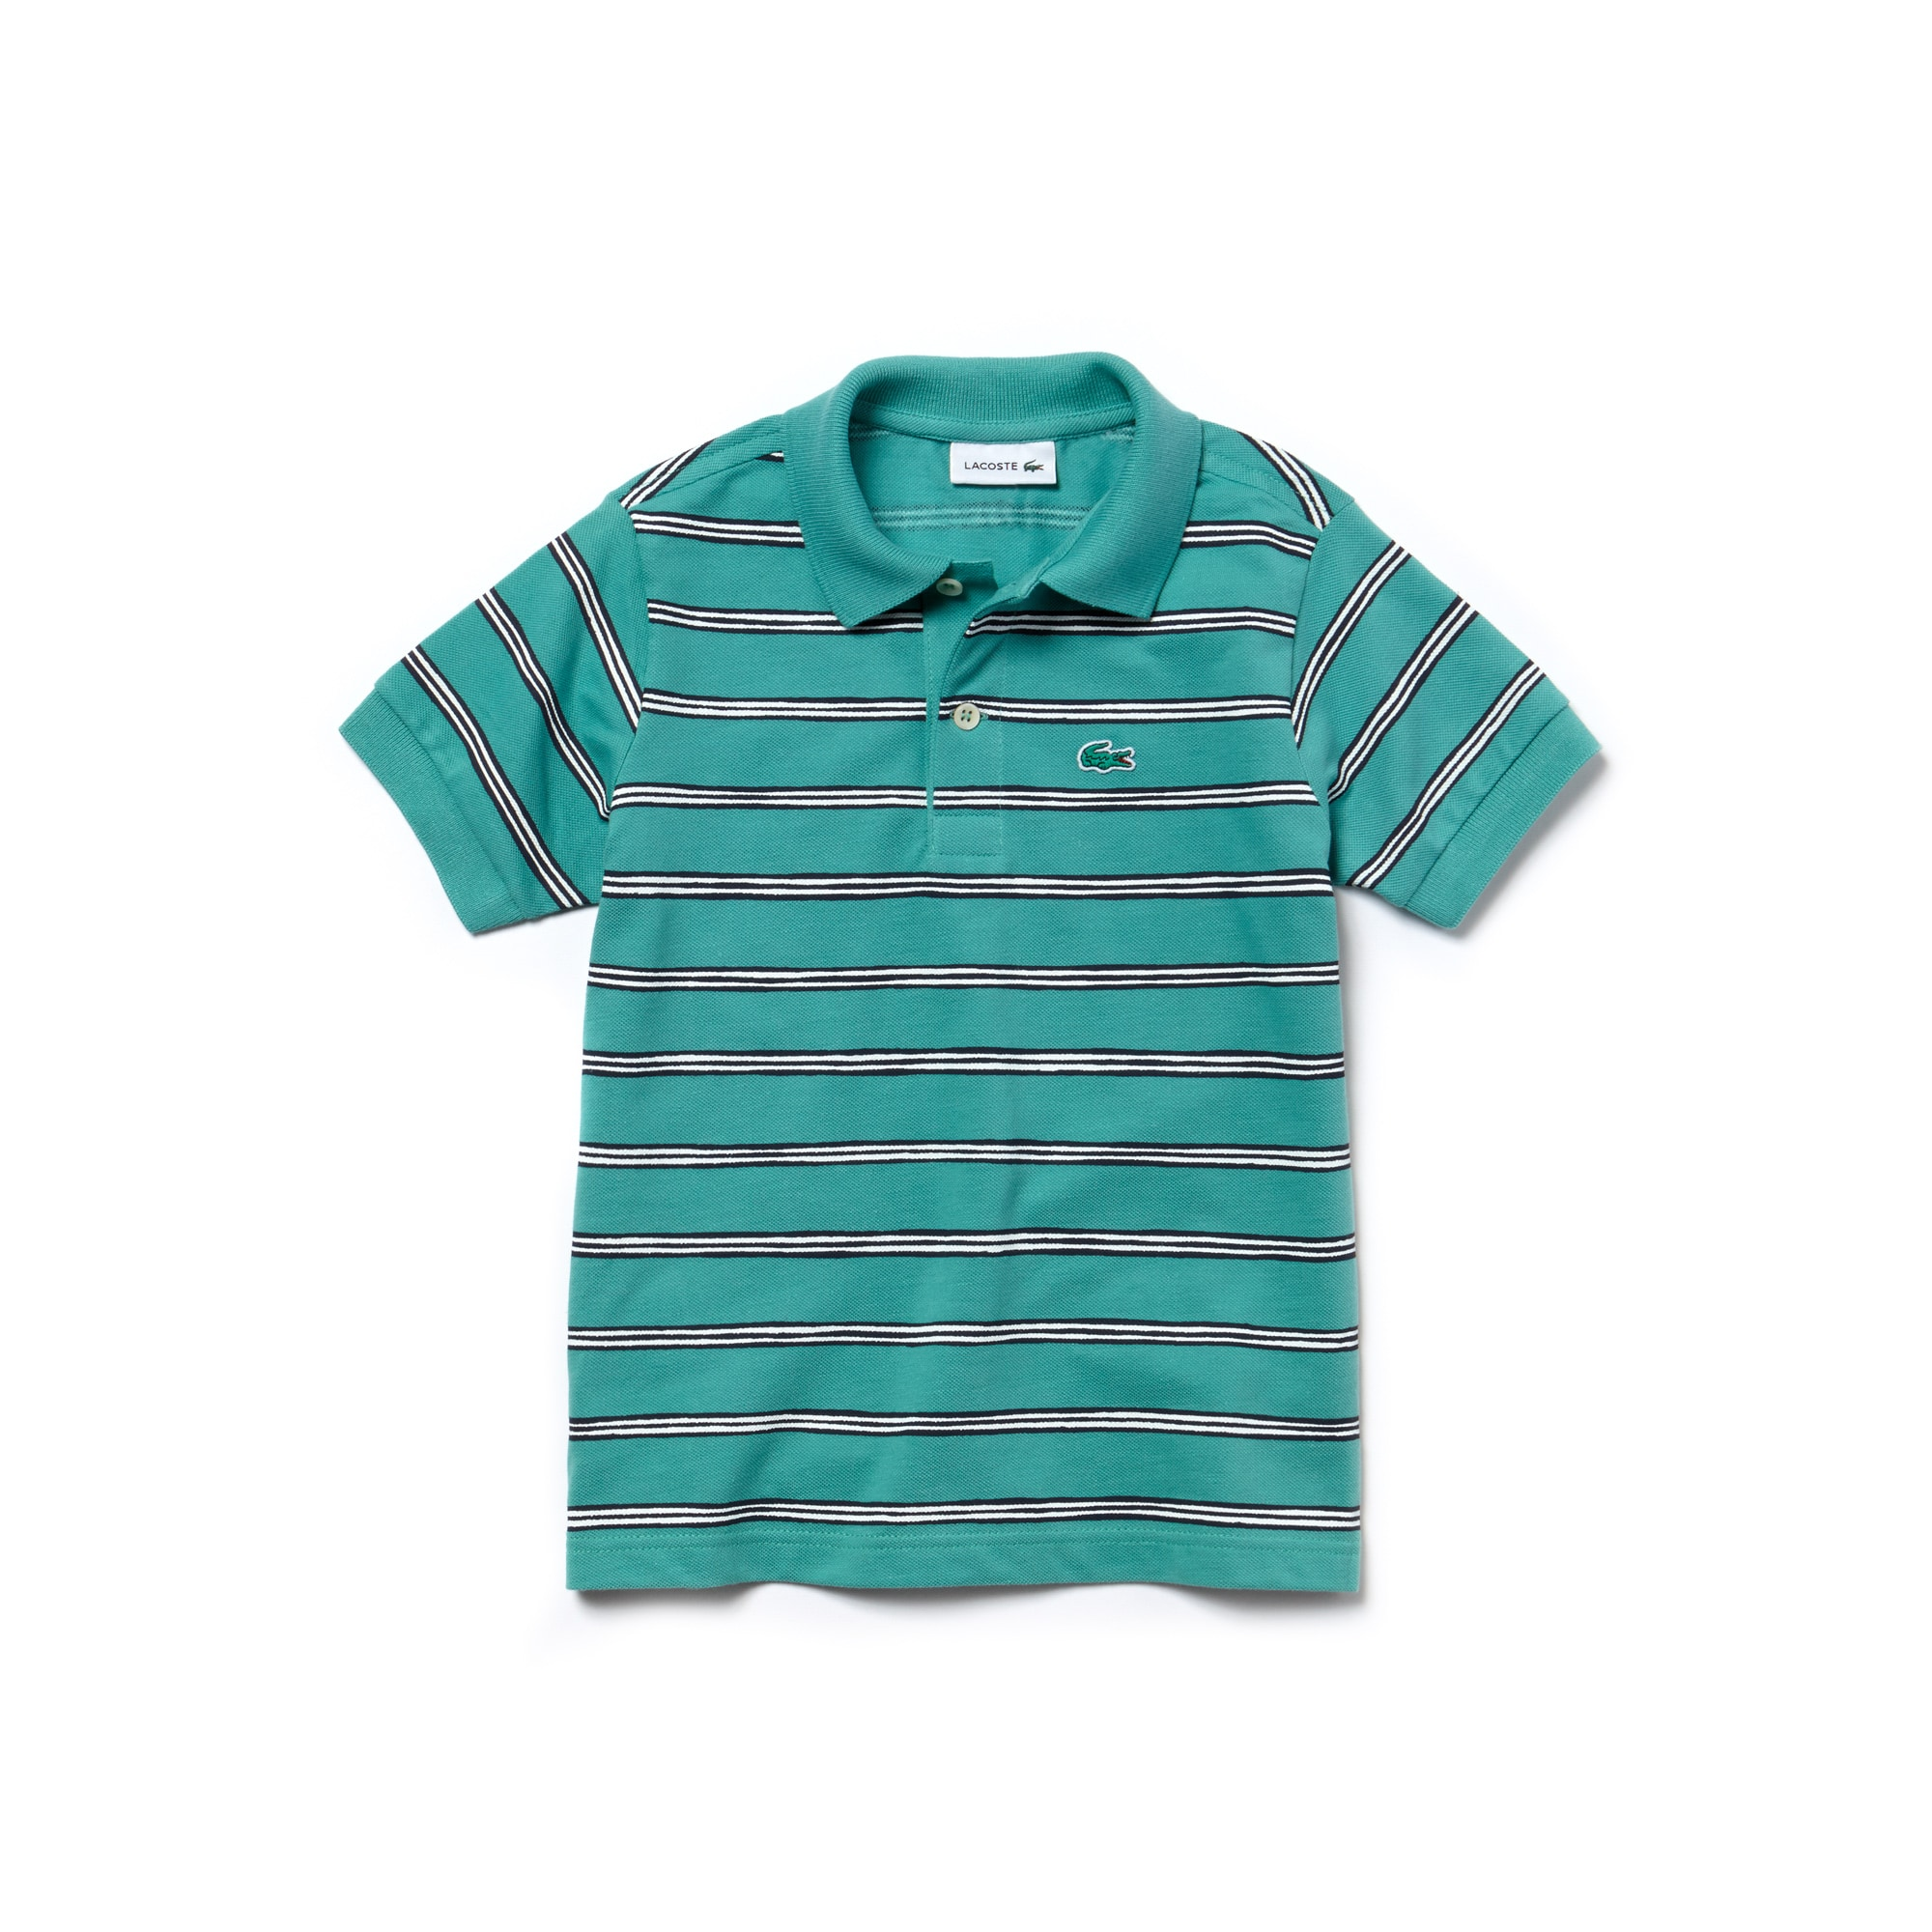 Gestreiftes Jungen LACOSTE Poloshirt aus Mini-Piqué